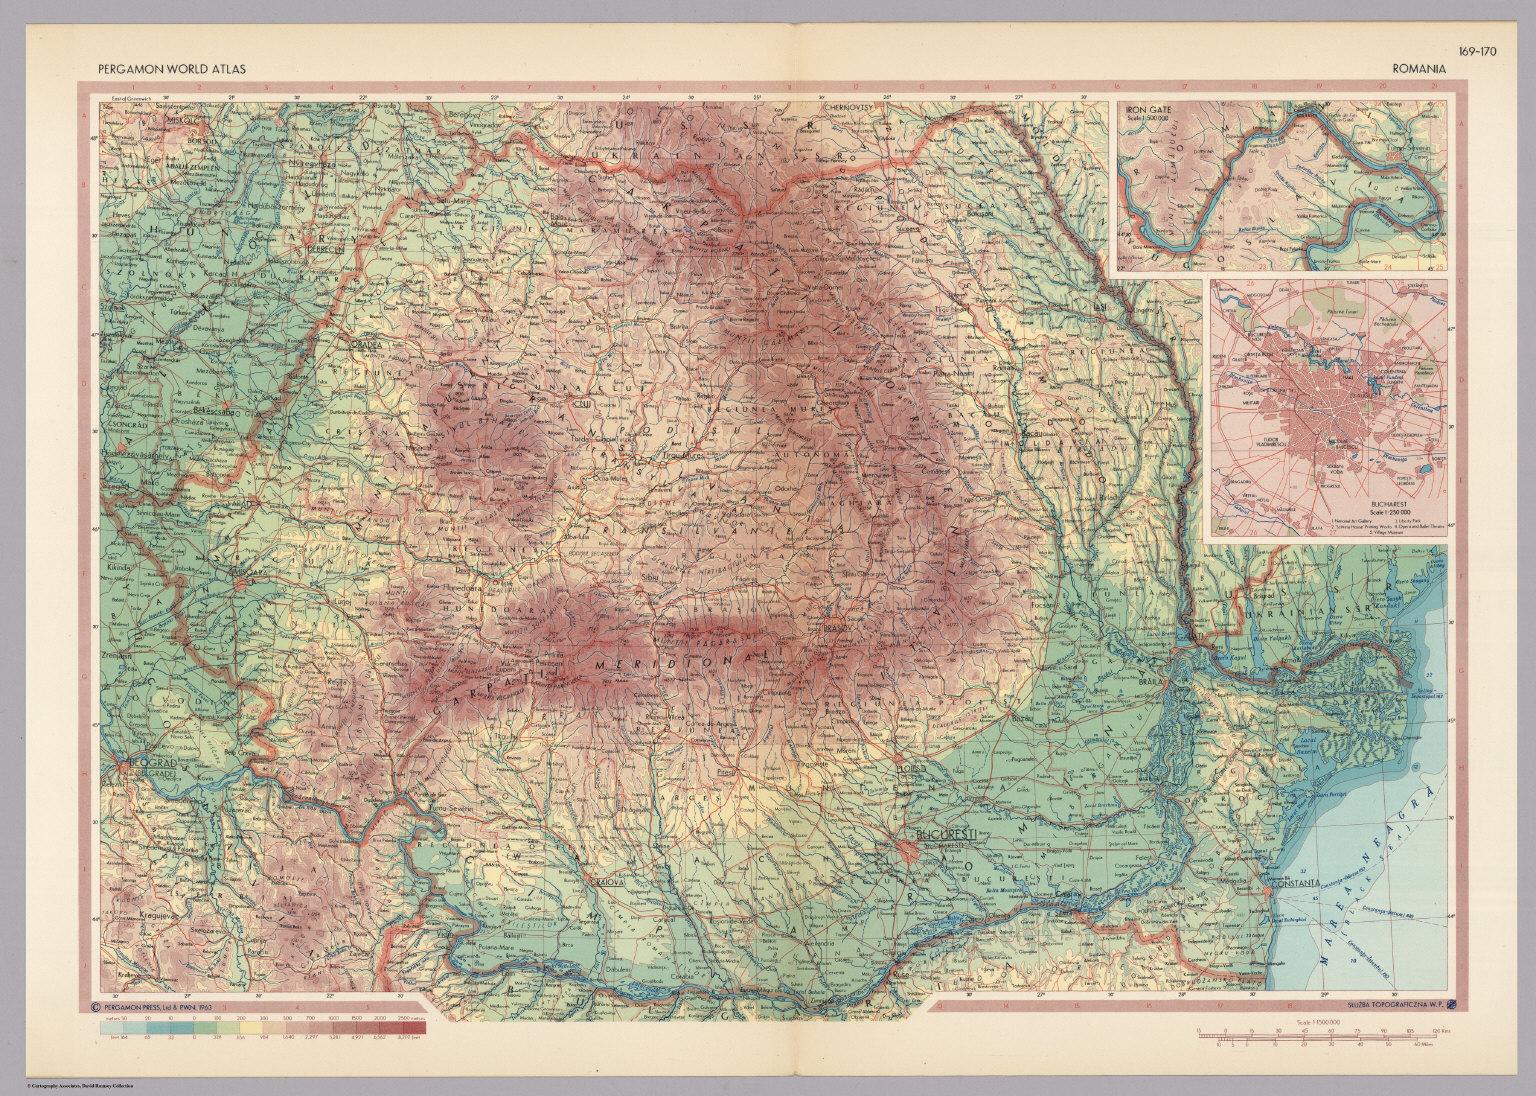 Romania pergamon world atlas david rumsey historical map collection pergamon world atlas gumiabroncs Images